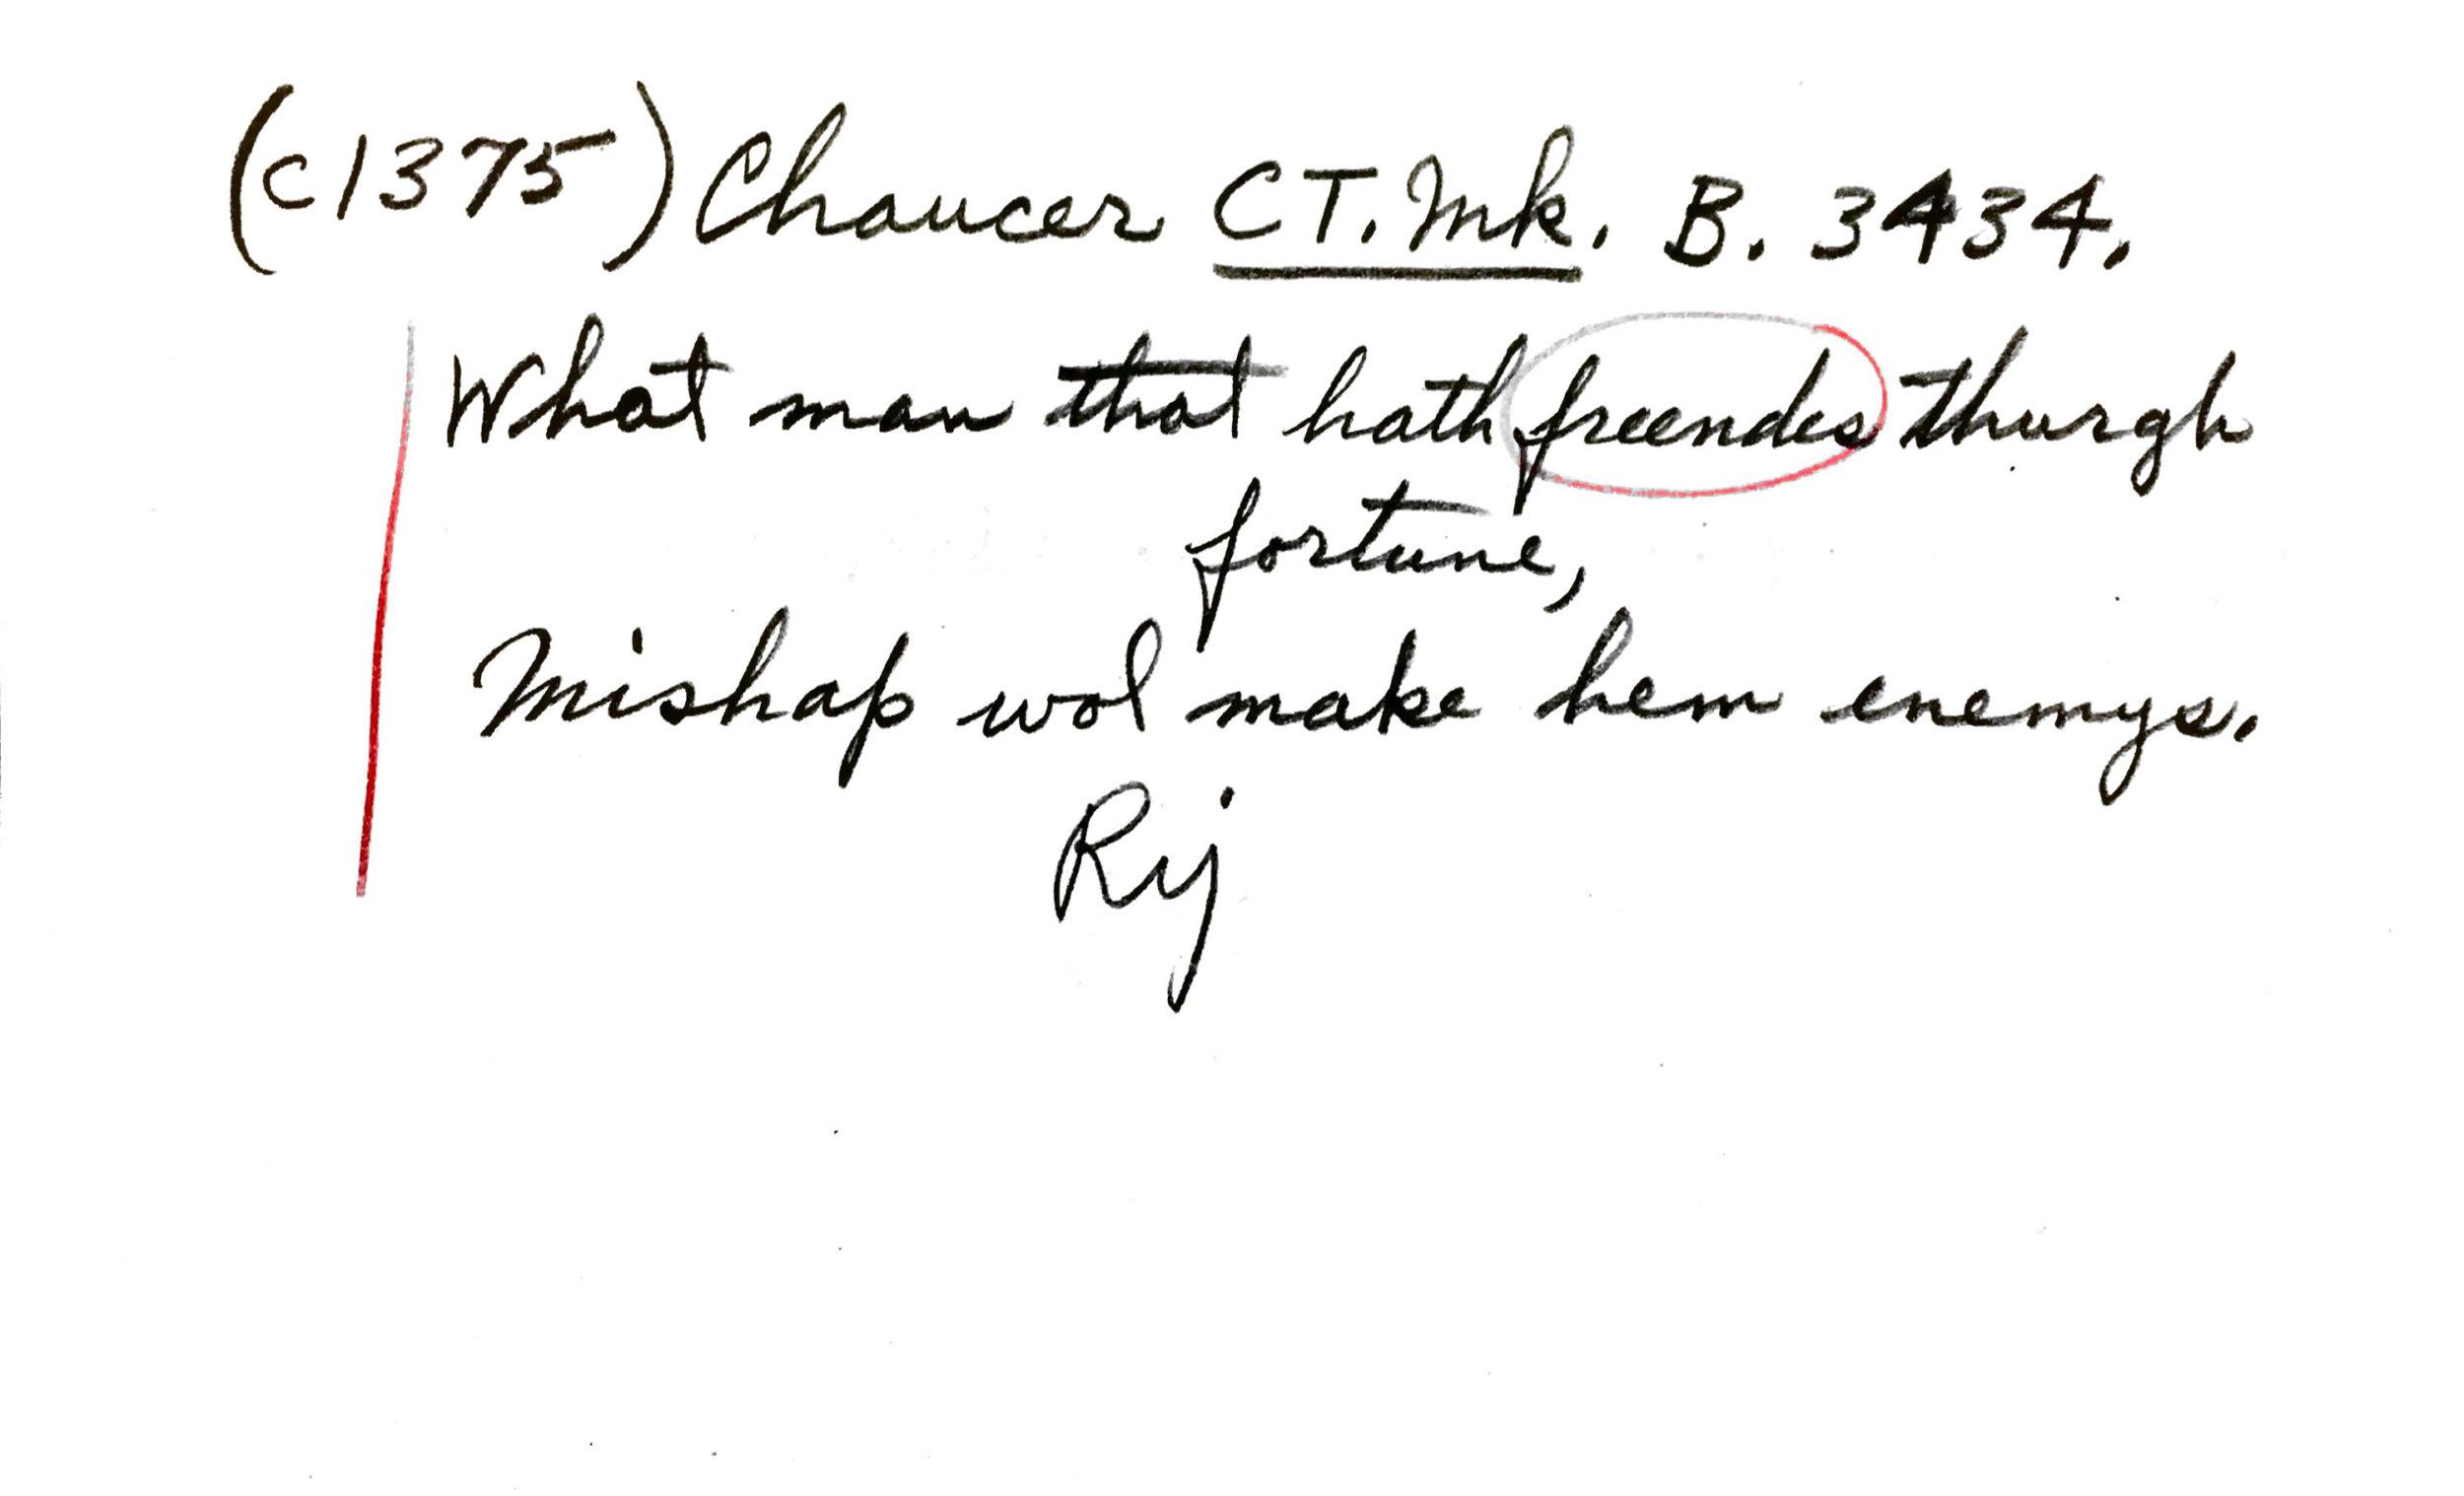 Chaucer citation slip